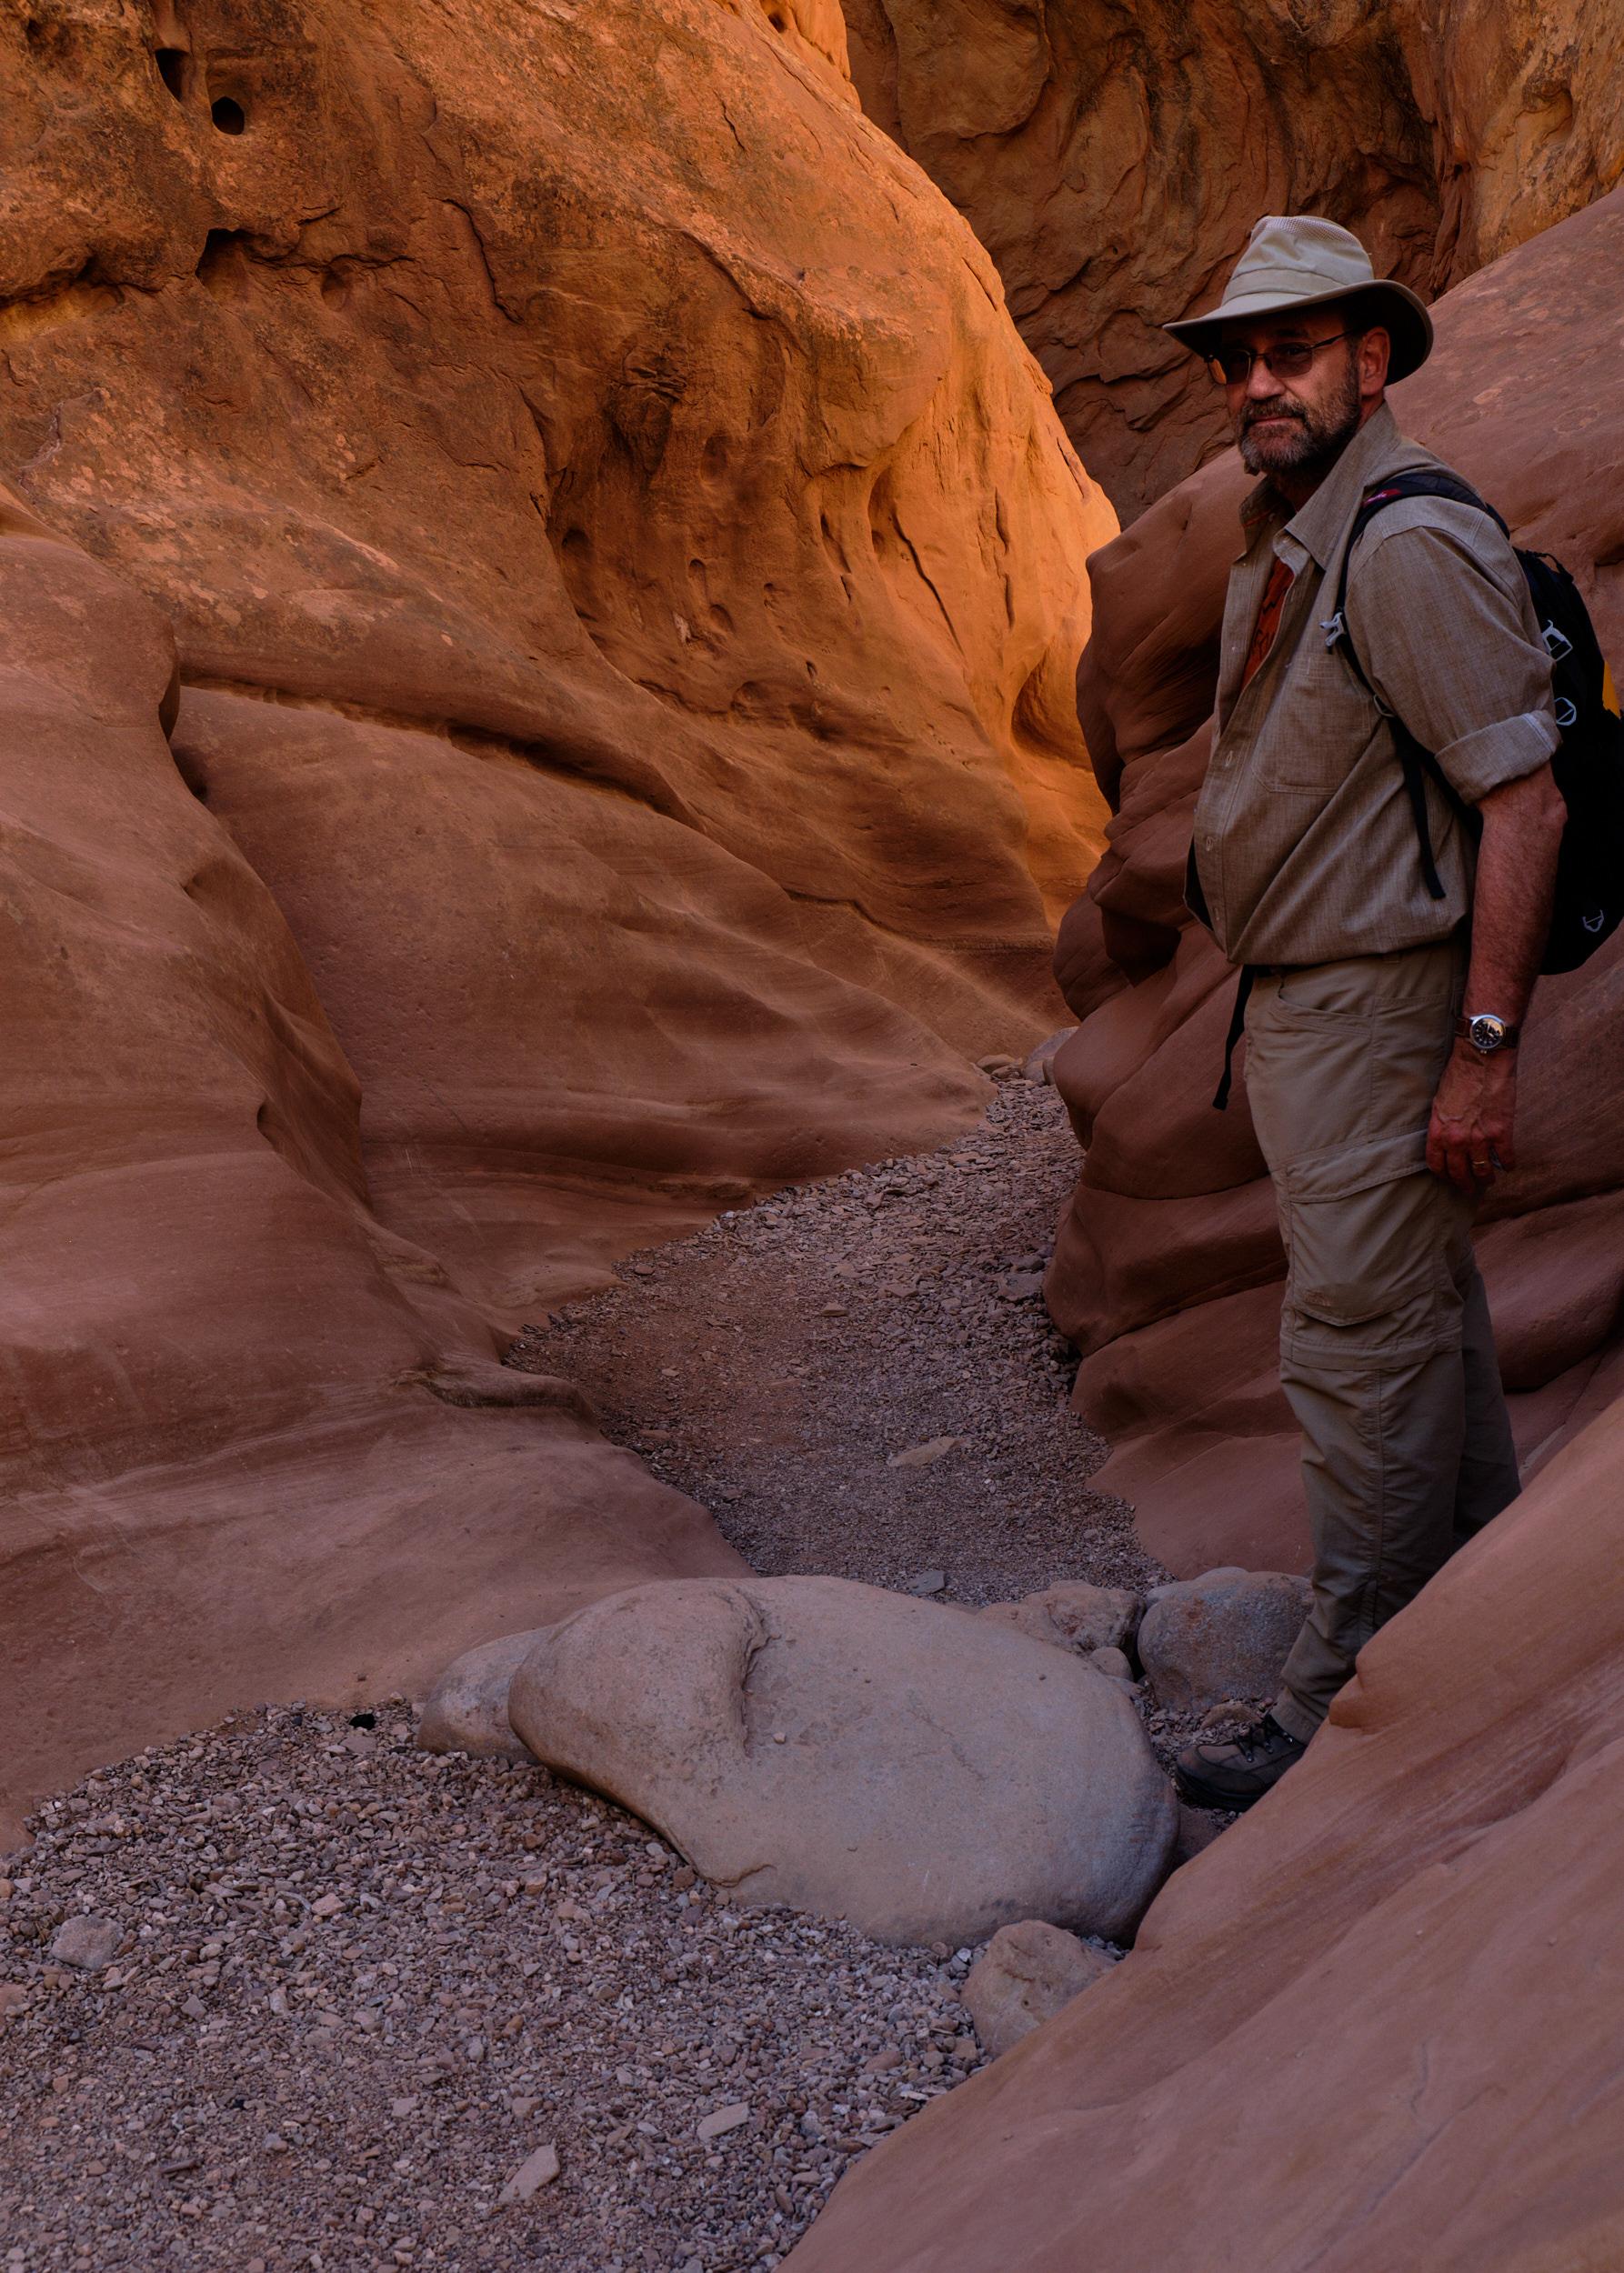 Dan, doing one of his favorite activities - exploring beautiful places.